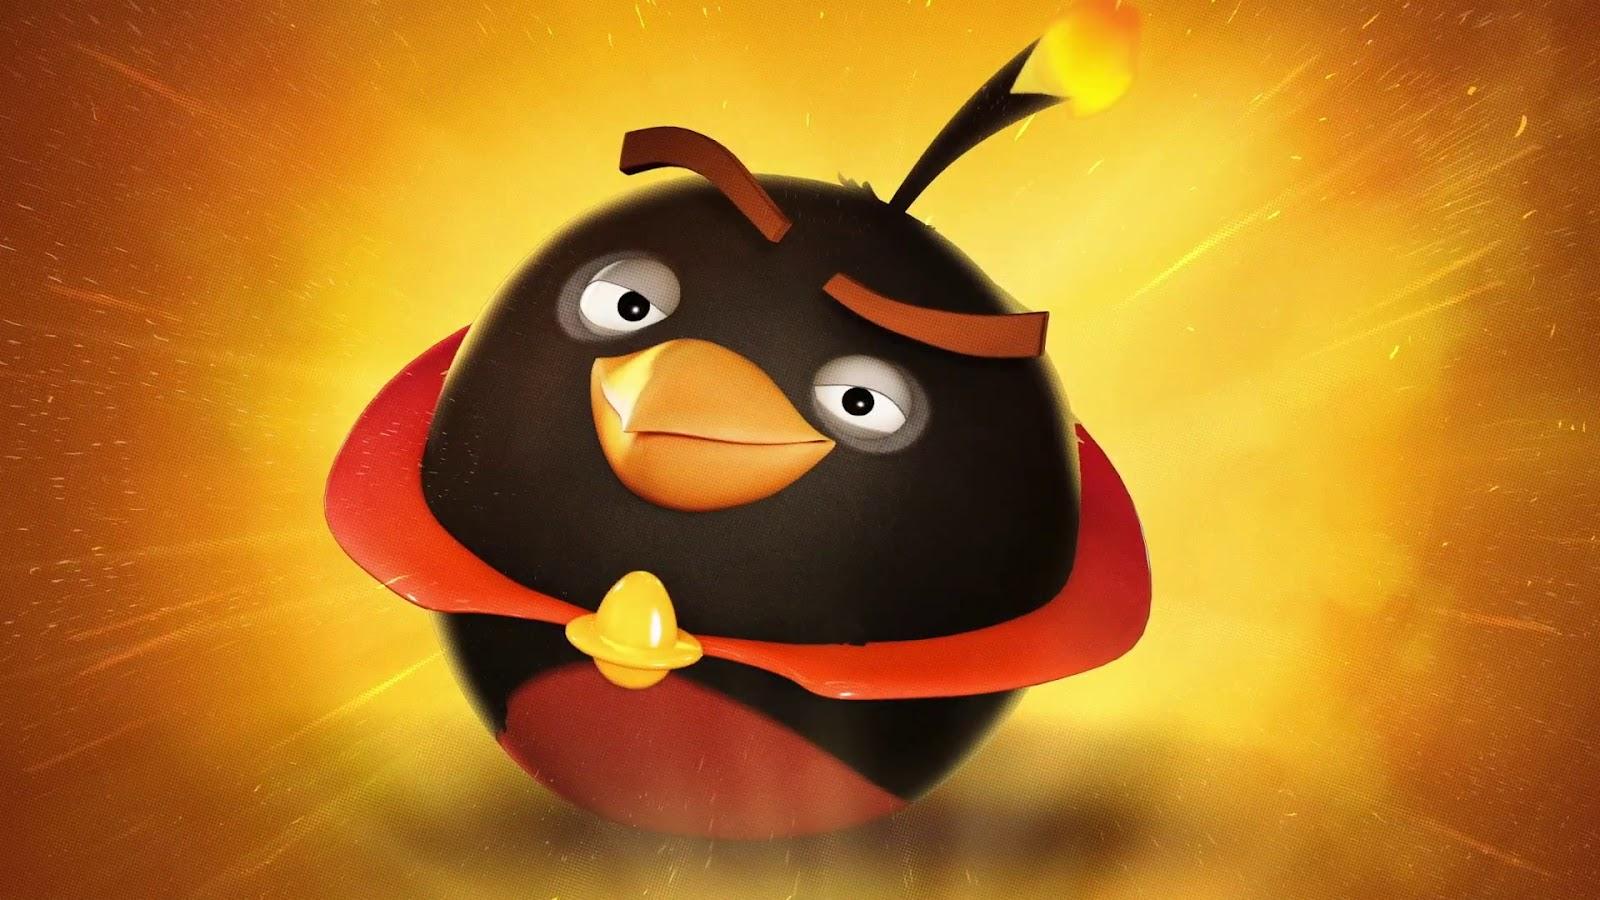 http://3.bp.blogspot.com/-RPA0fevFN-8/T3V7h0-iqhI/AAAAAAAAAAk/dgj8guKCWkg/s1600/Bomb.jpg